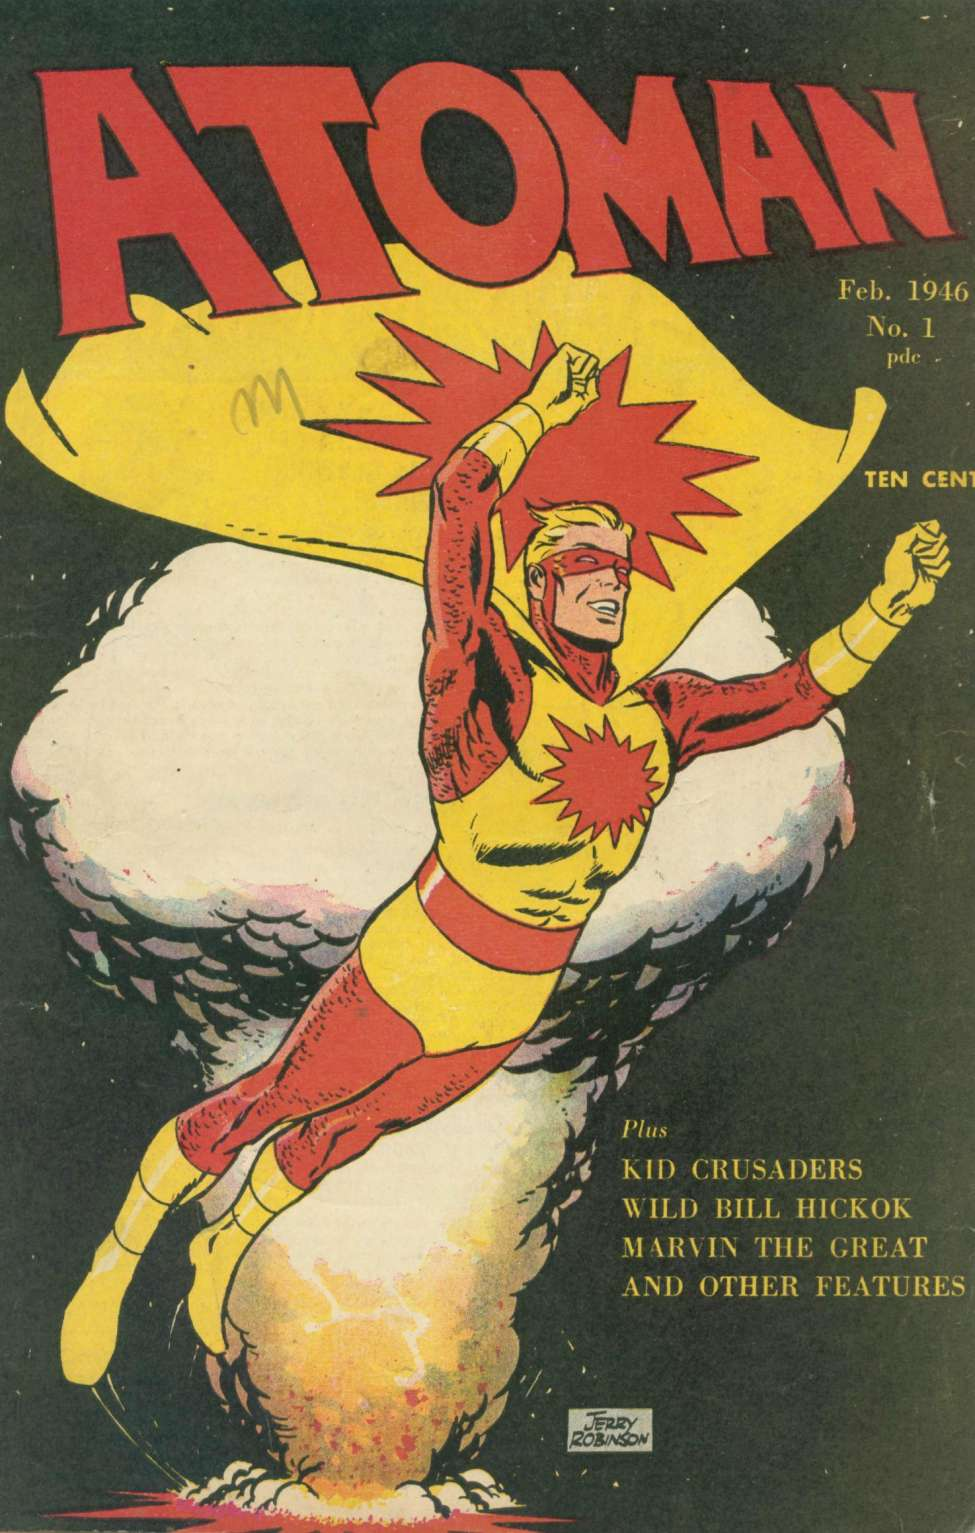 Comic Book Cover For Atoman Comics #1